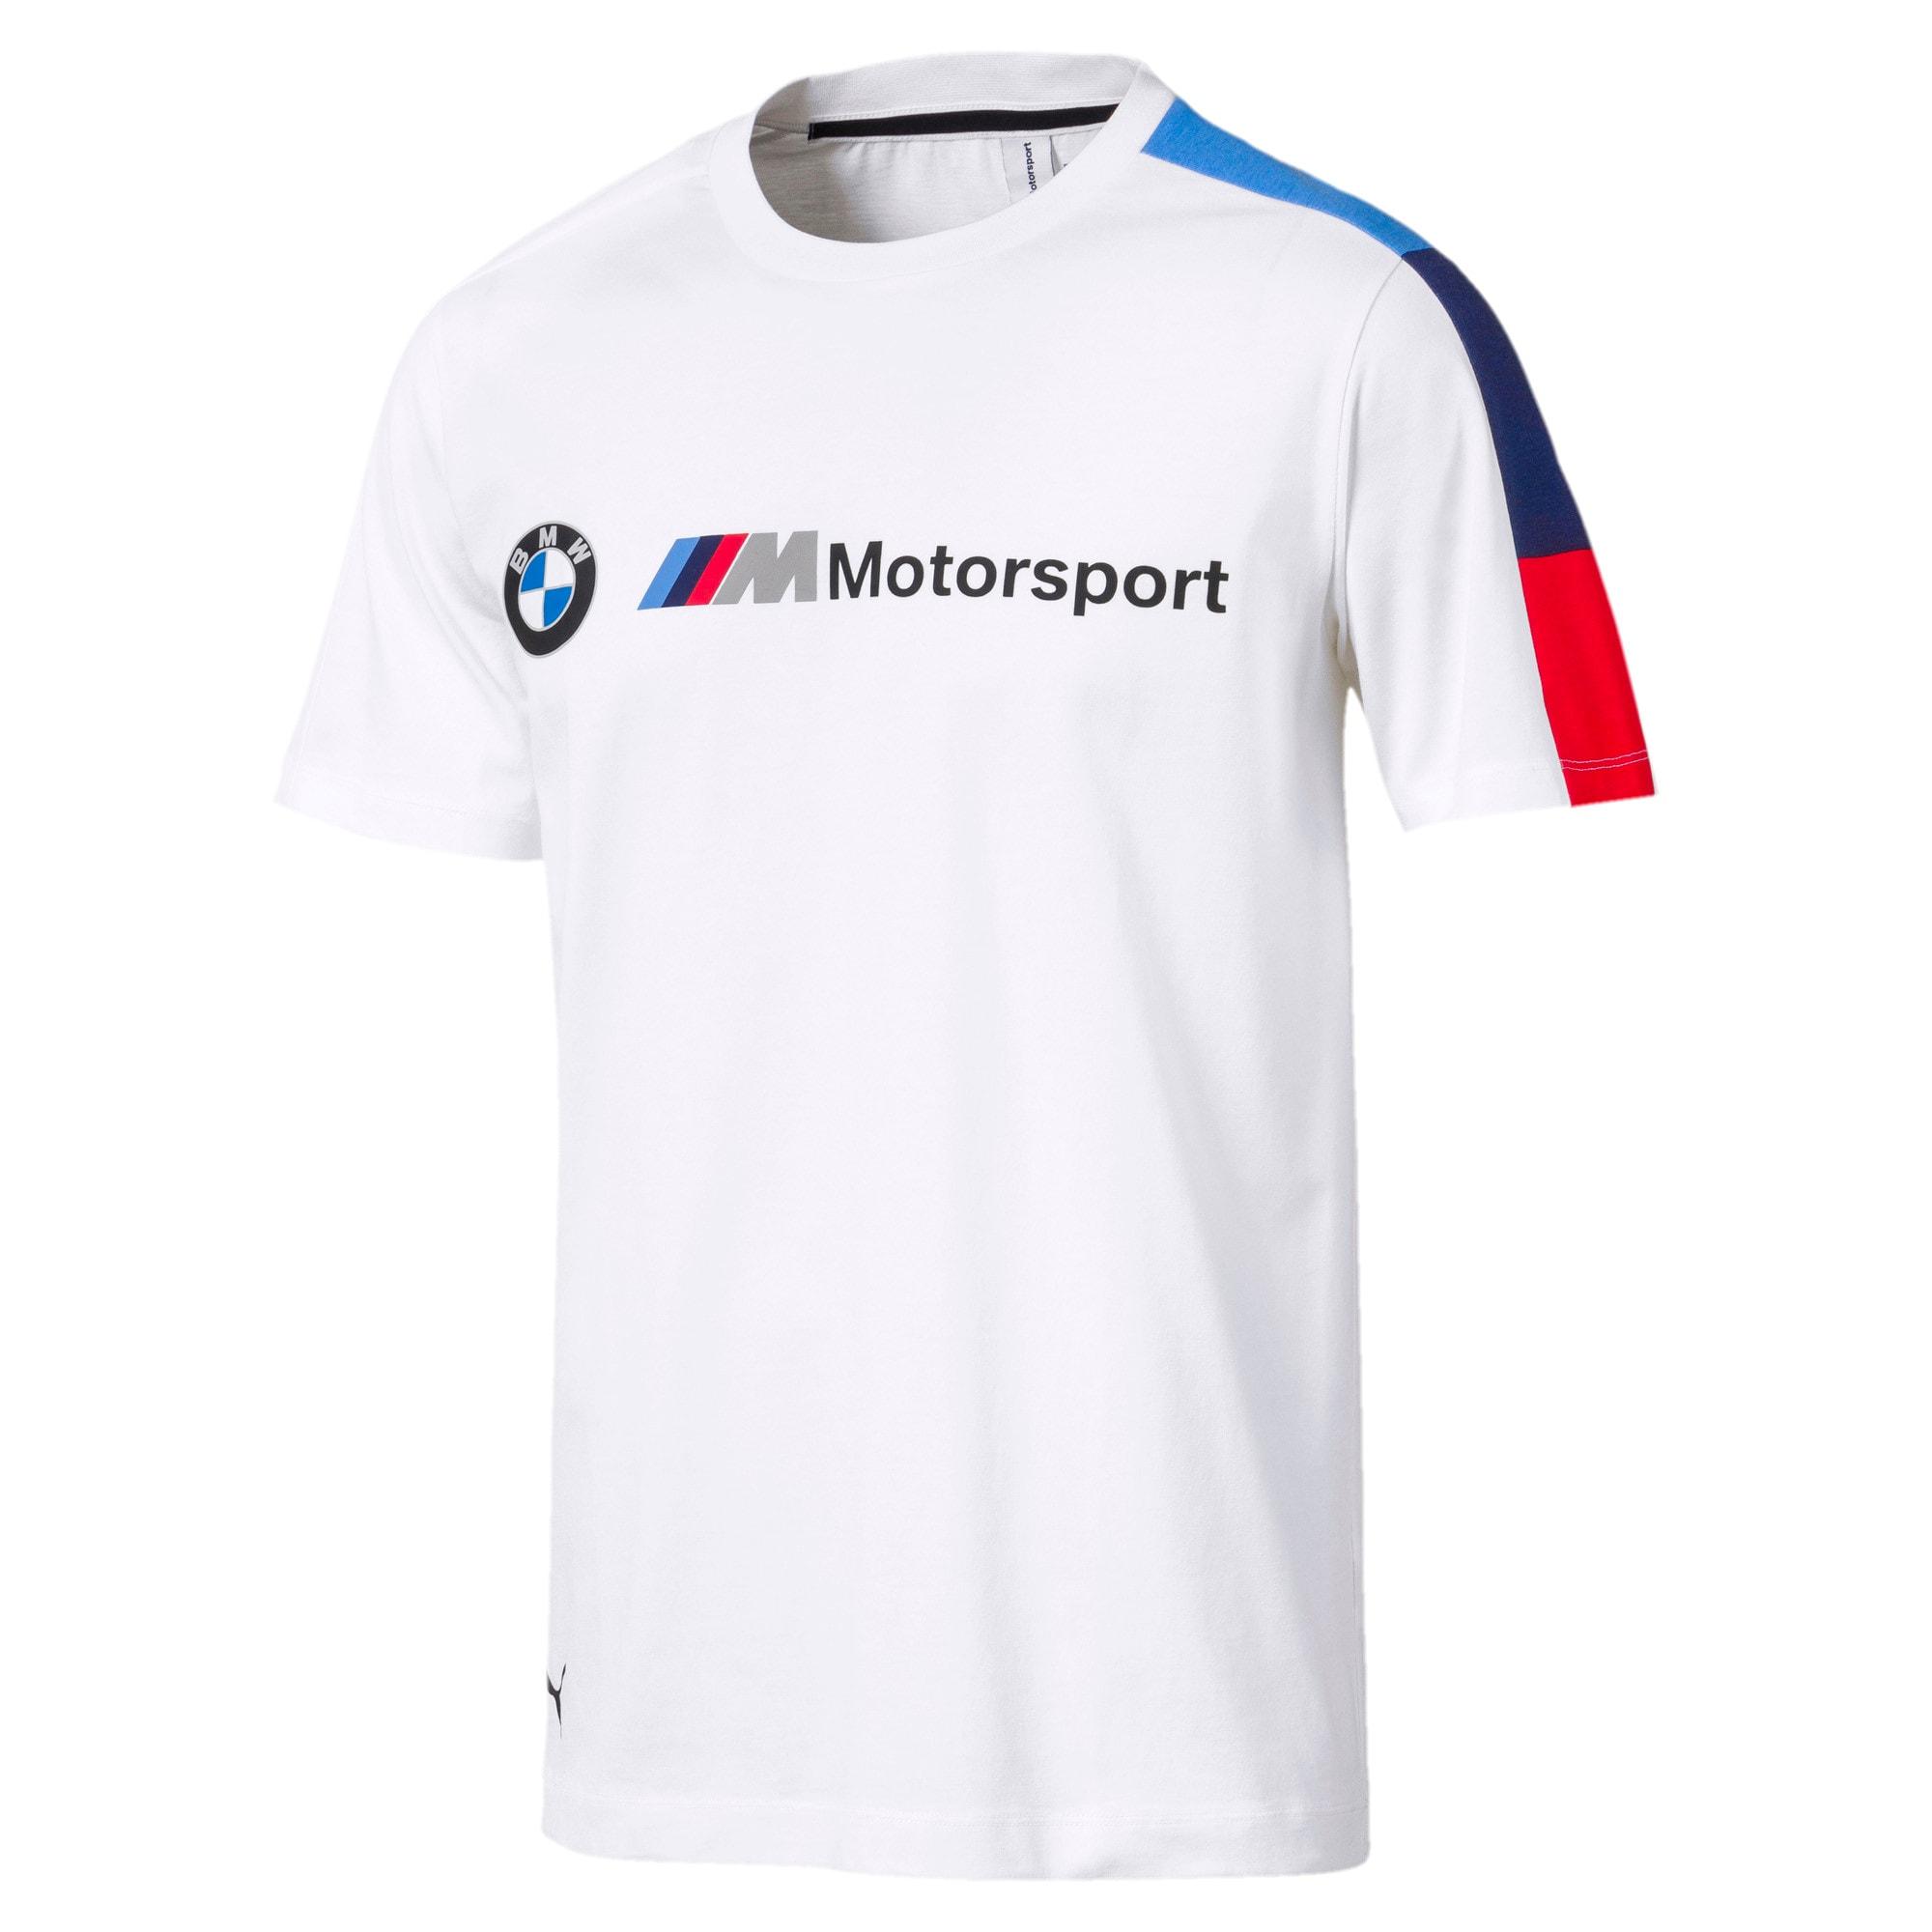 Thumbnail 1 of BMW M Motorsport Men's T7 T-Shirt, Puma White, medium